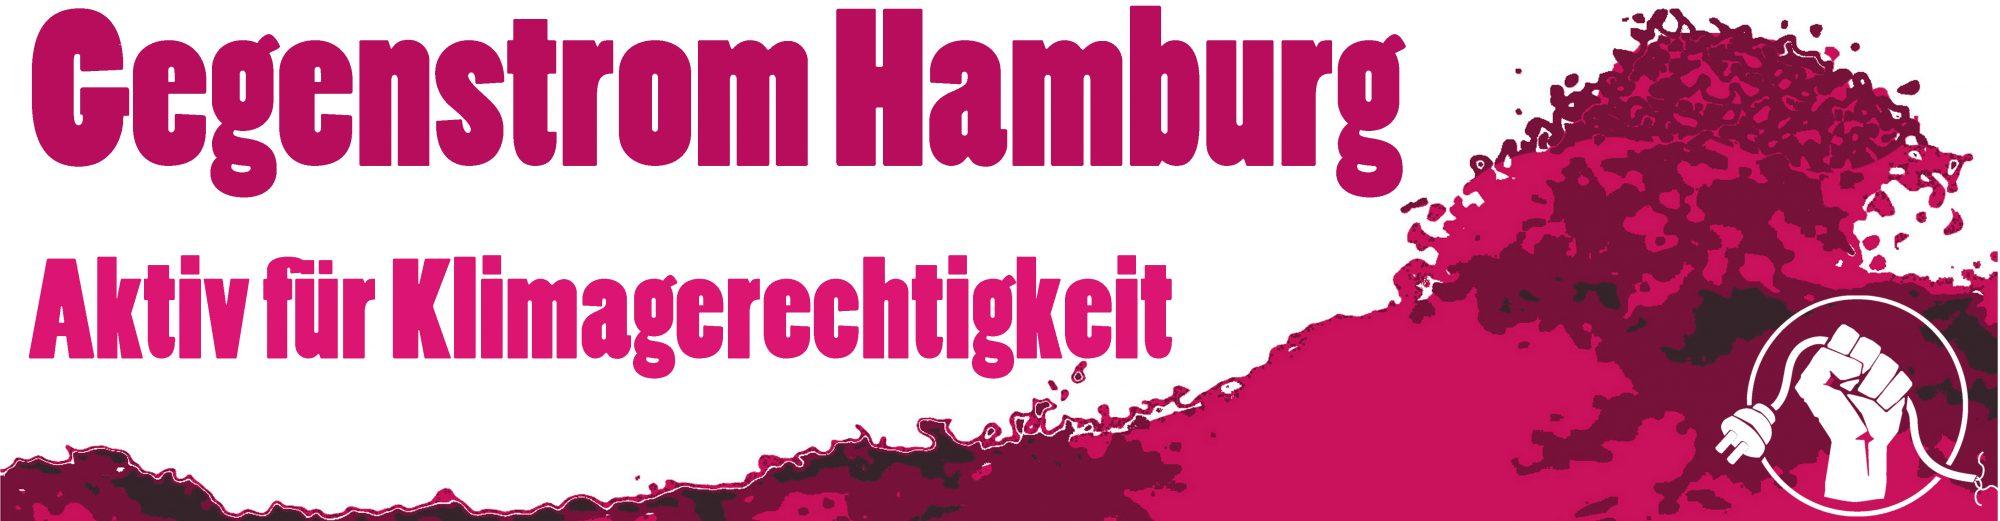 Gegenstrom Hamburg